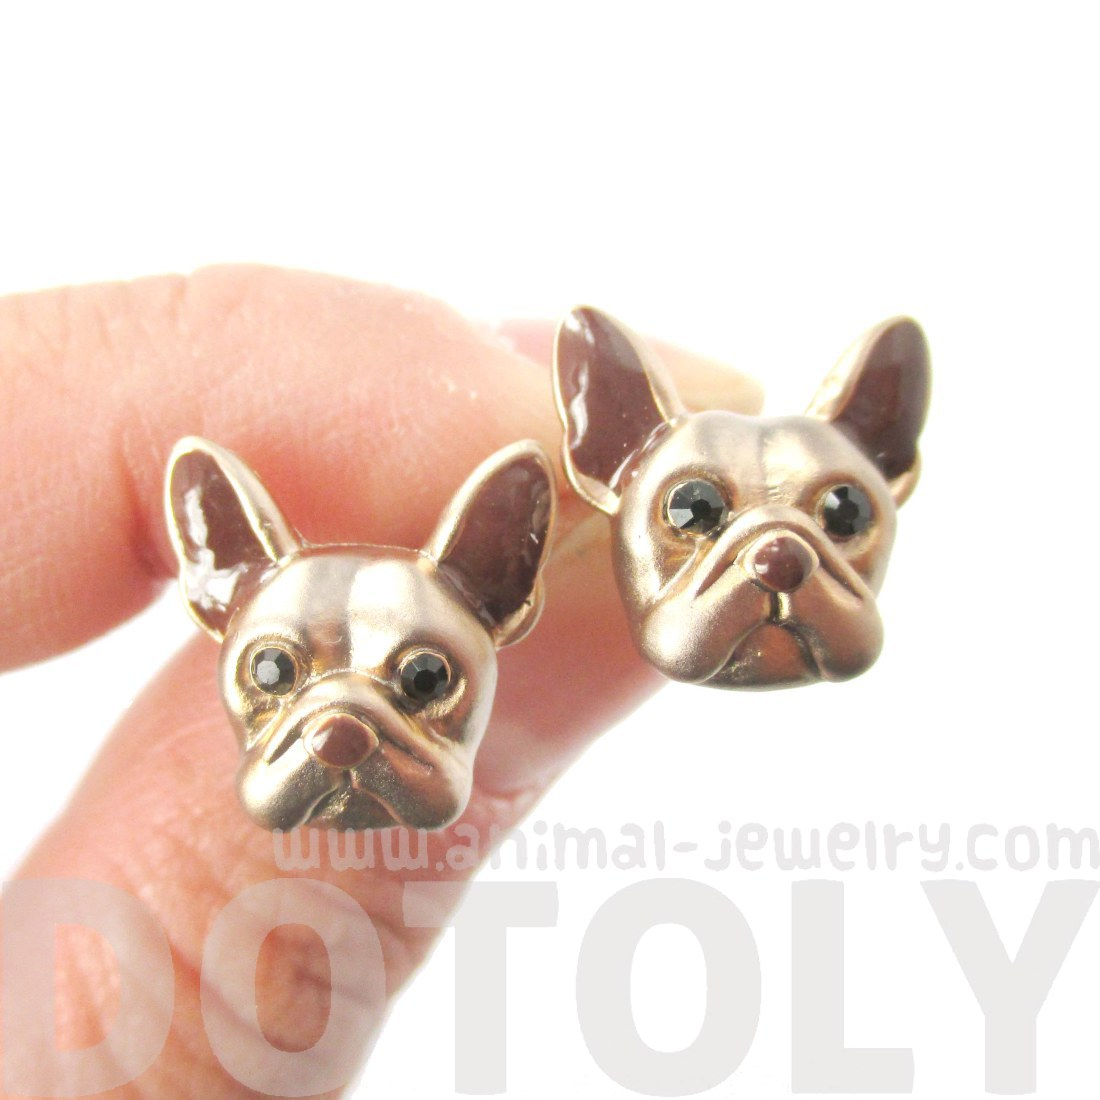 Small French Bulldog Shaped Dog Themed Enamel Stud